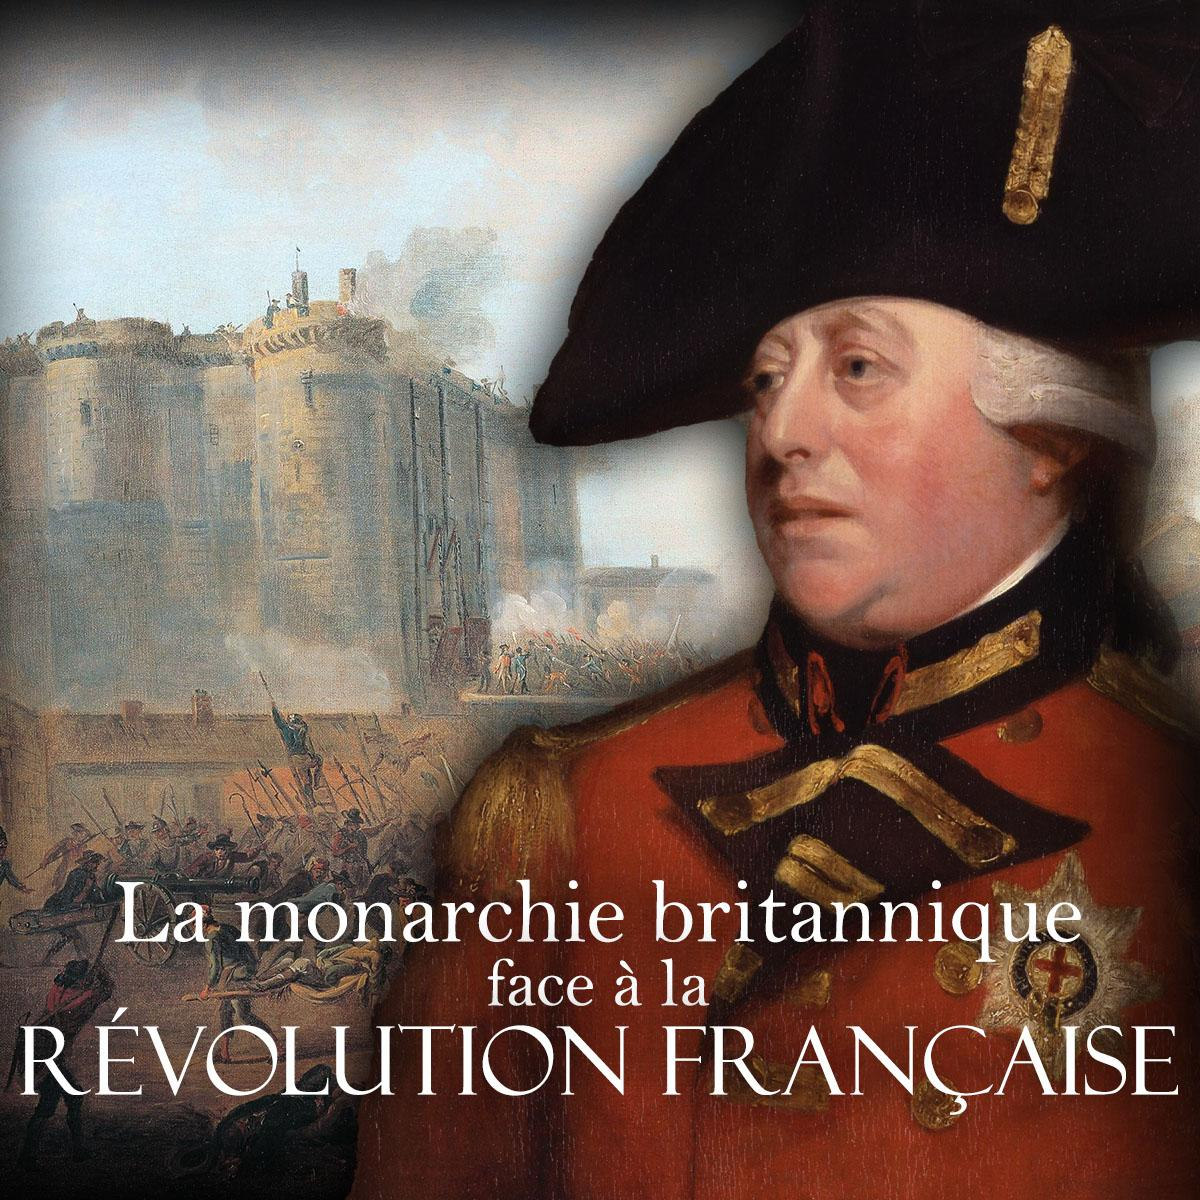 George iii revolution francaise